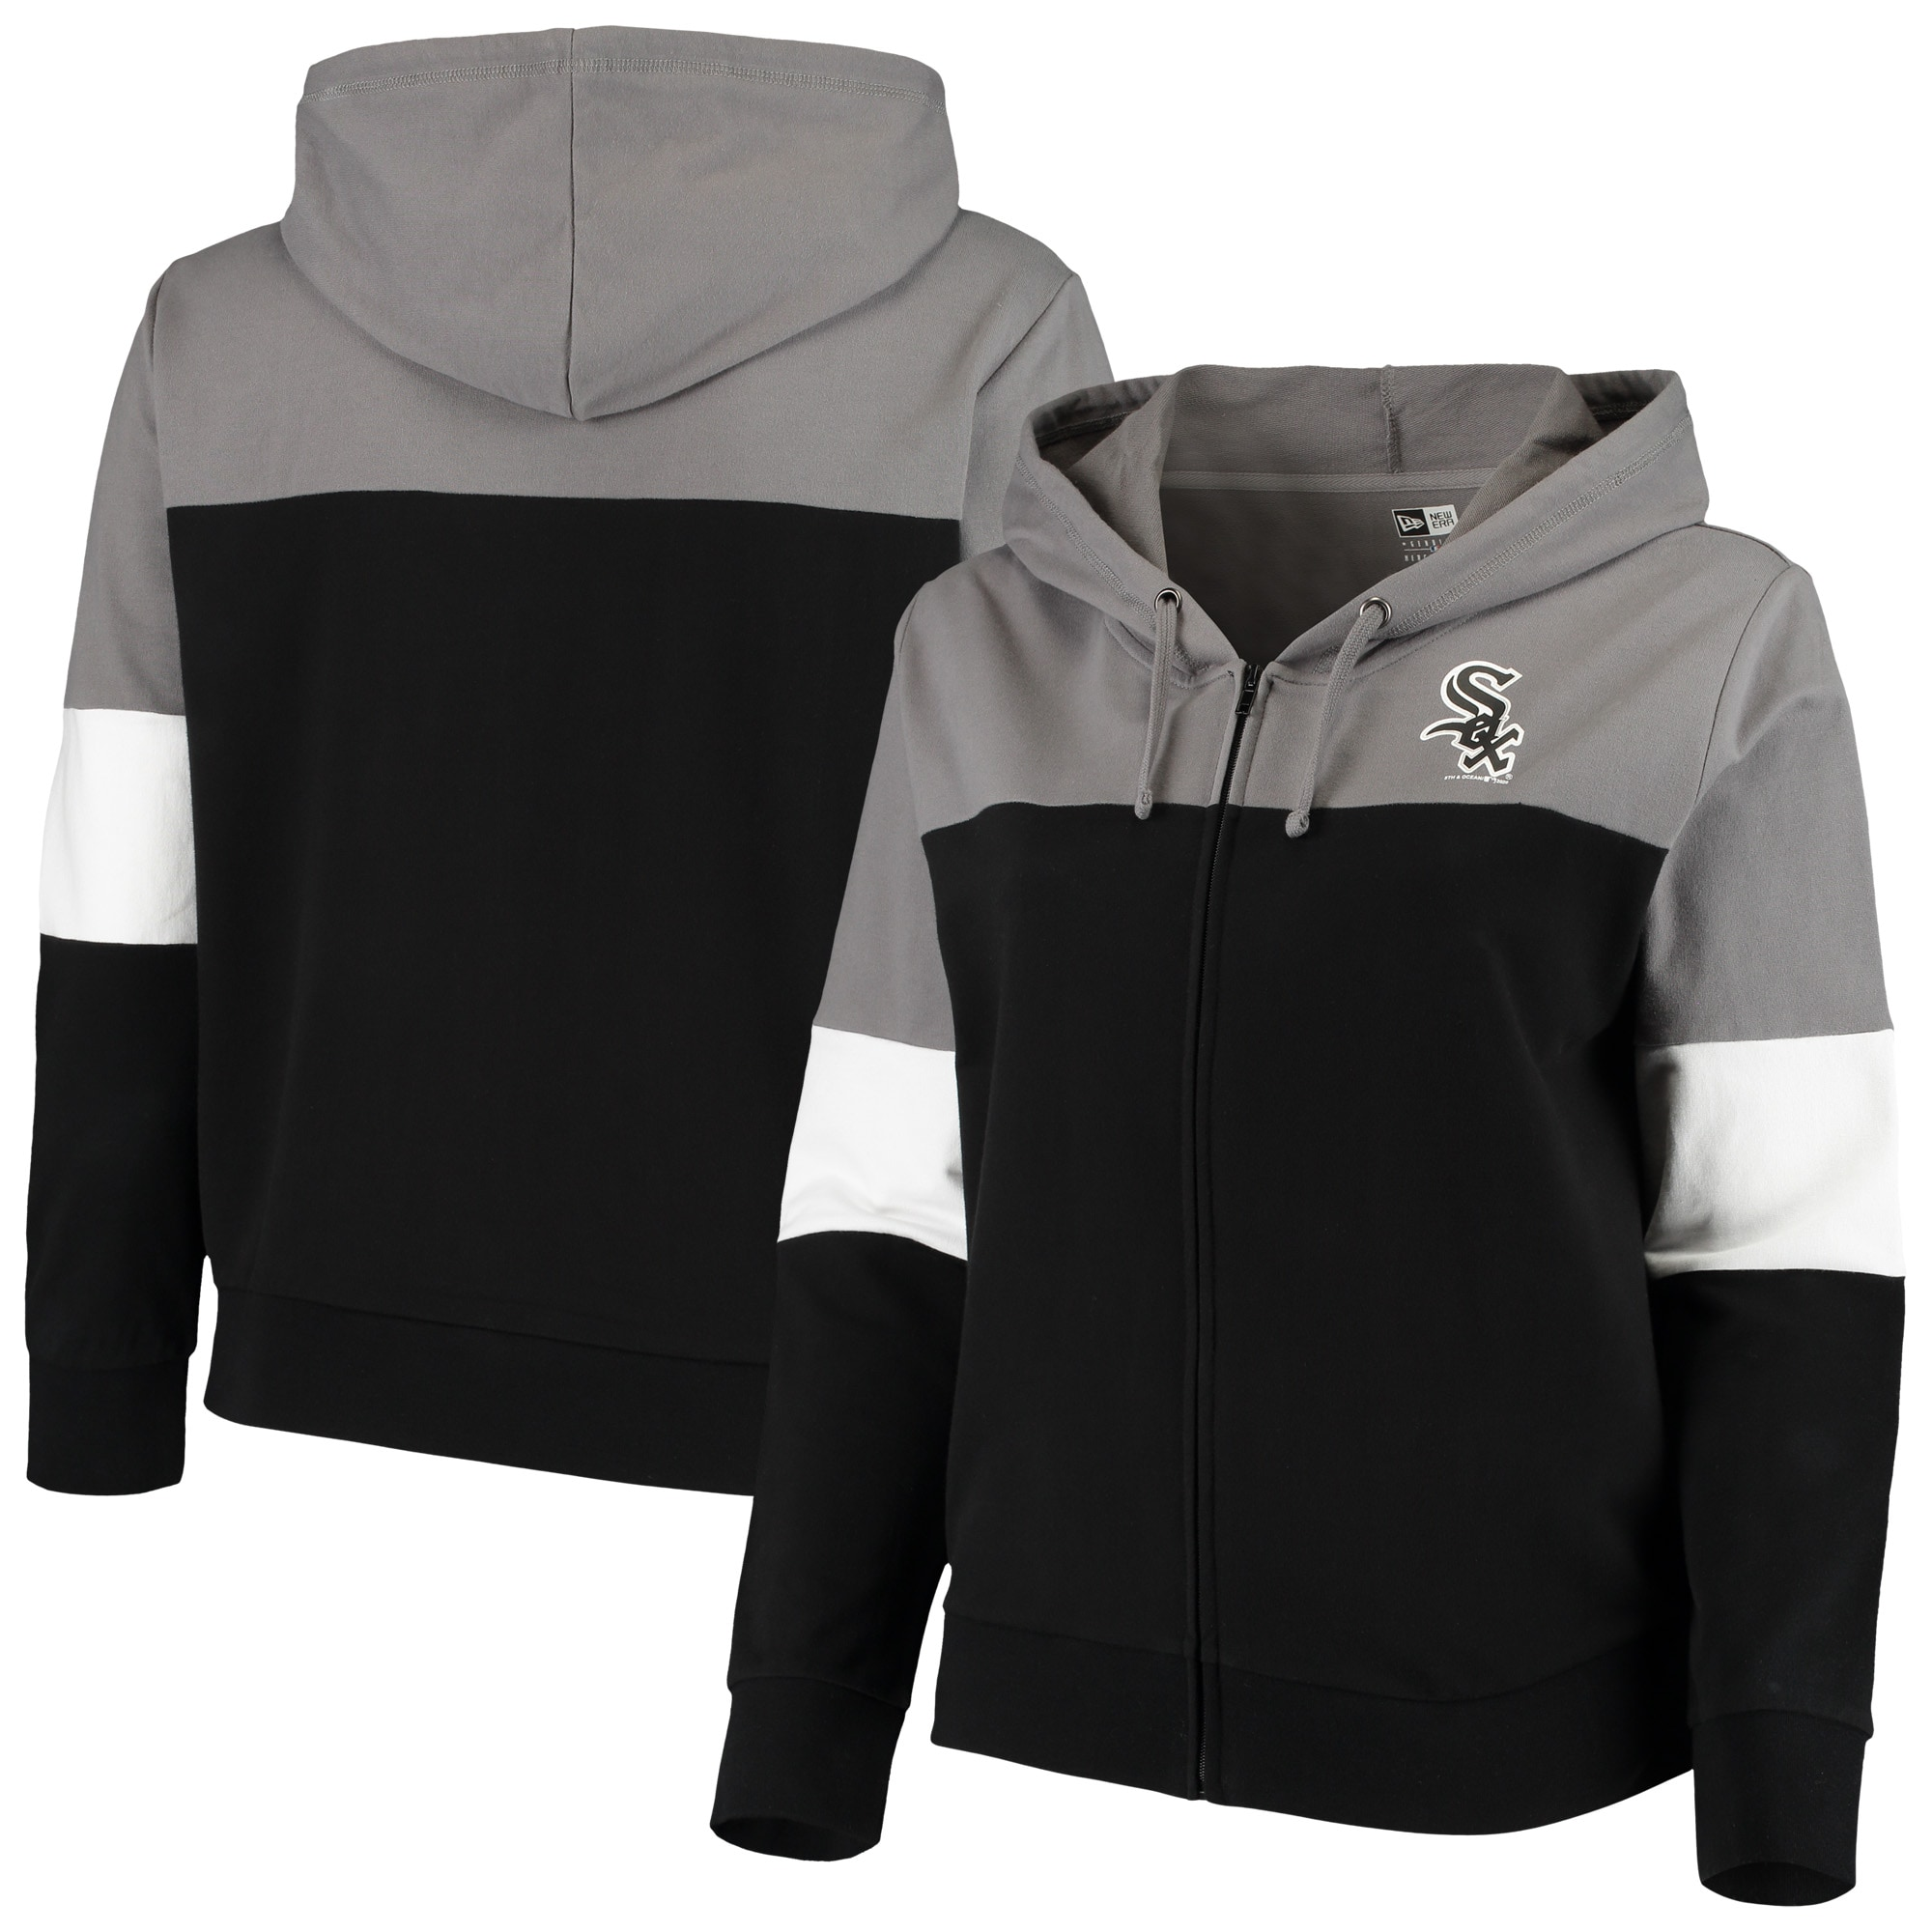 American Football Trikot Kurzarm Herren Dallas Cowboys Demarcus Lawrence # 90 Ganzjahres-Sport Casual Design Bequemes Material Team Farbe T-Shirt.